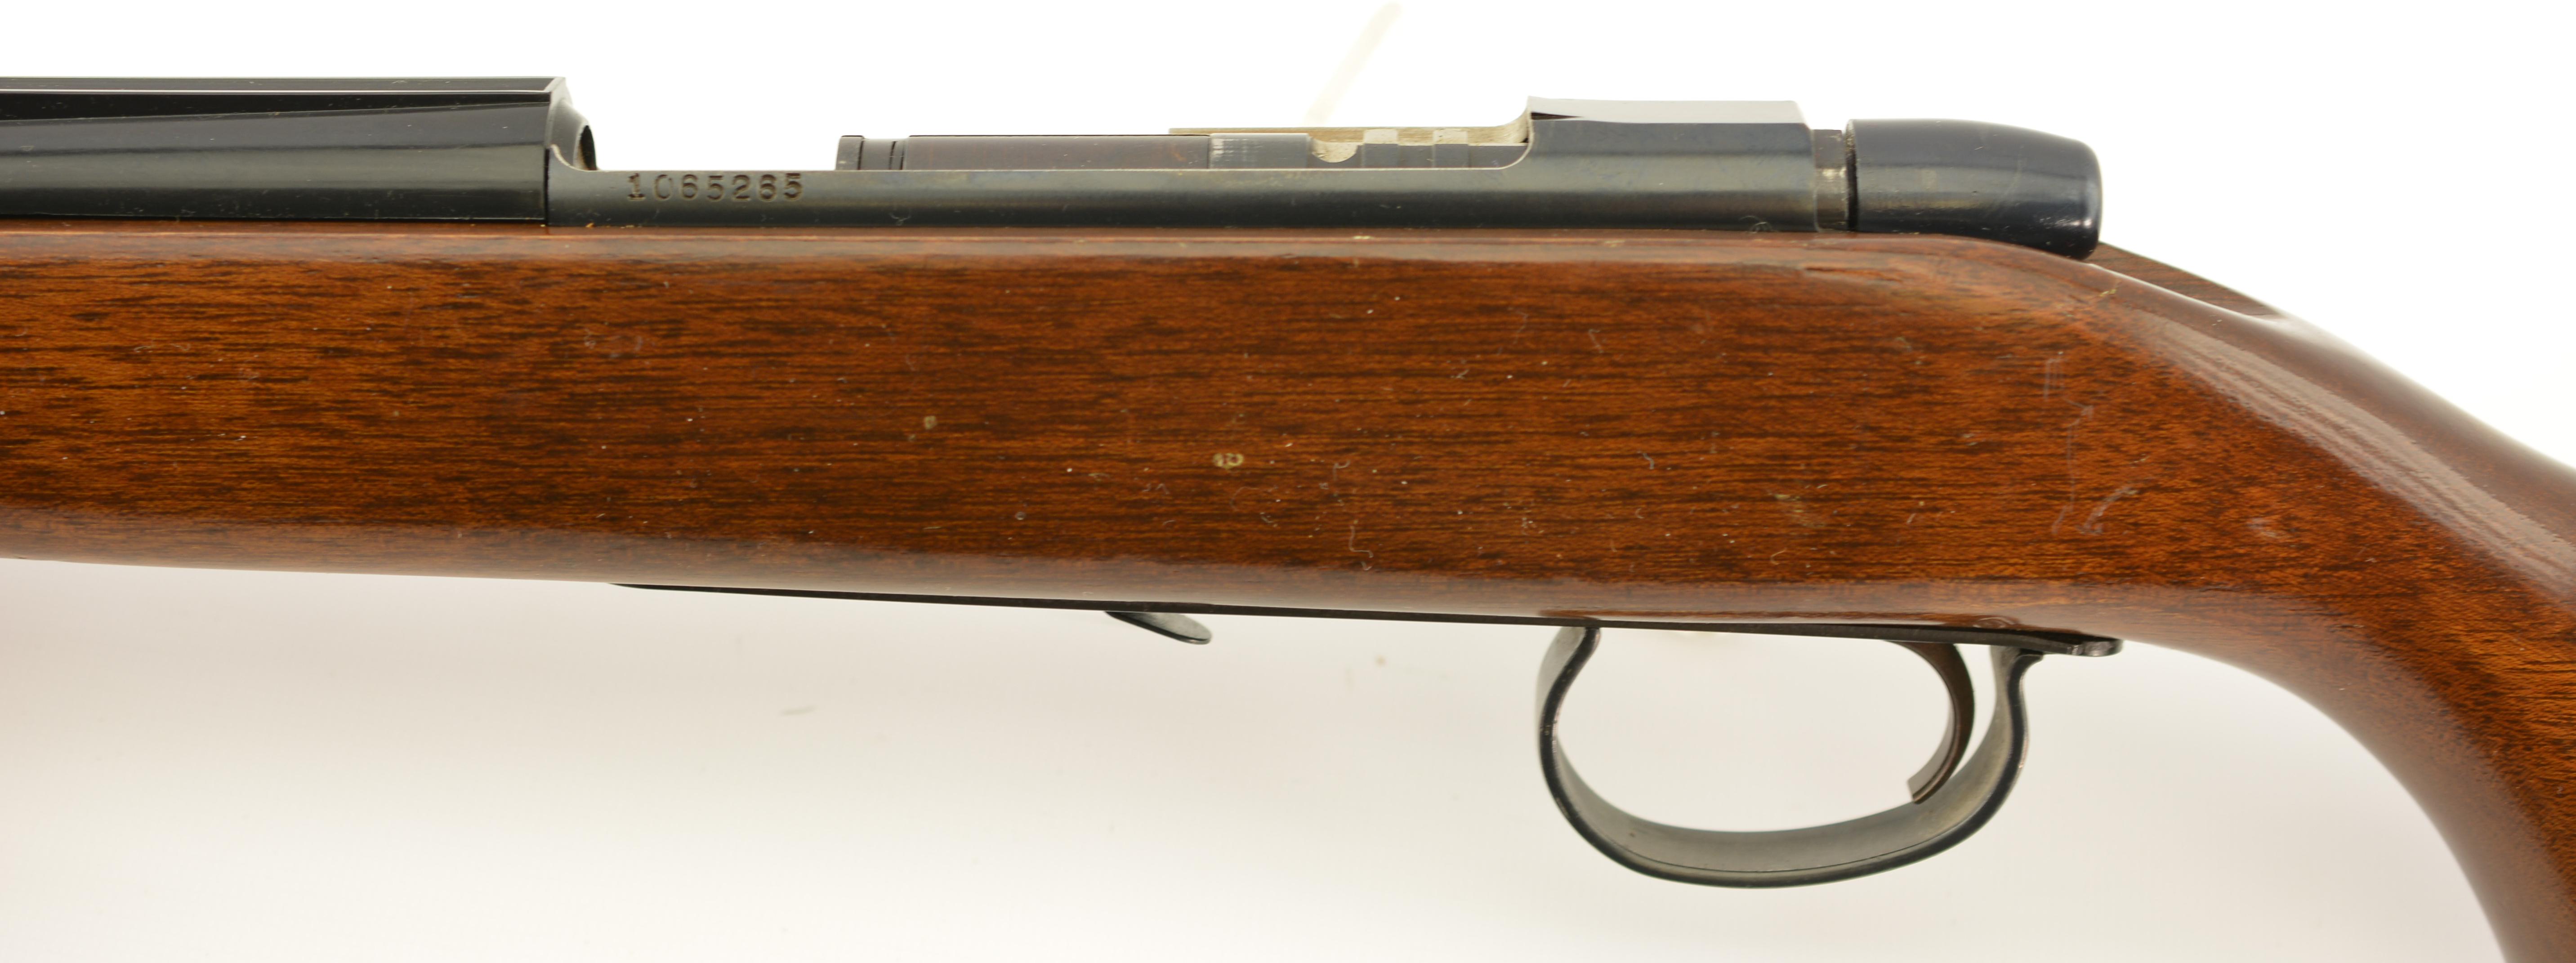 Published Factory Cutaway Remington Rifle Model 581-1